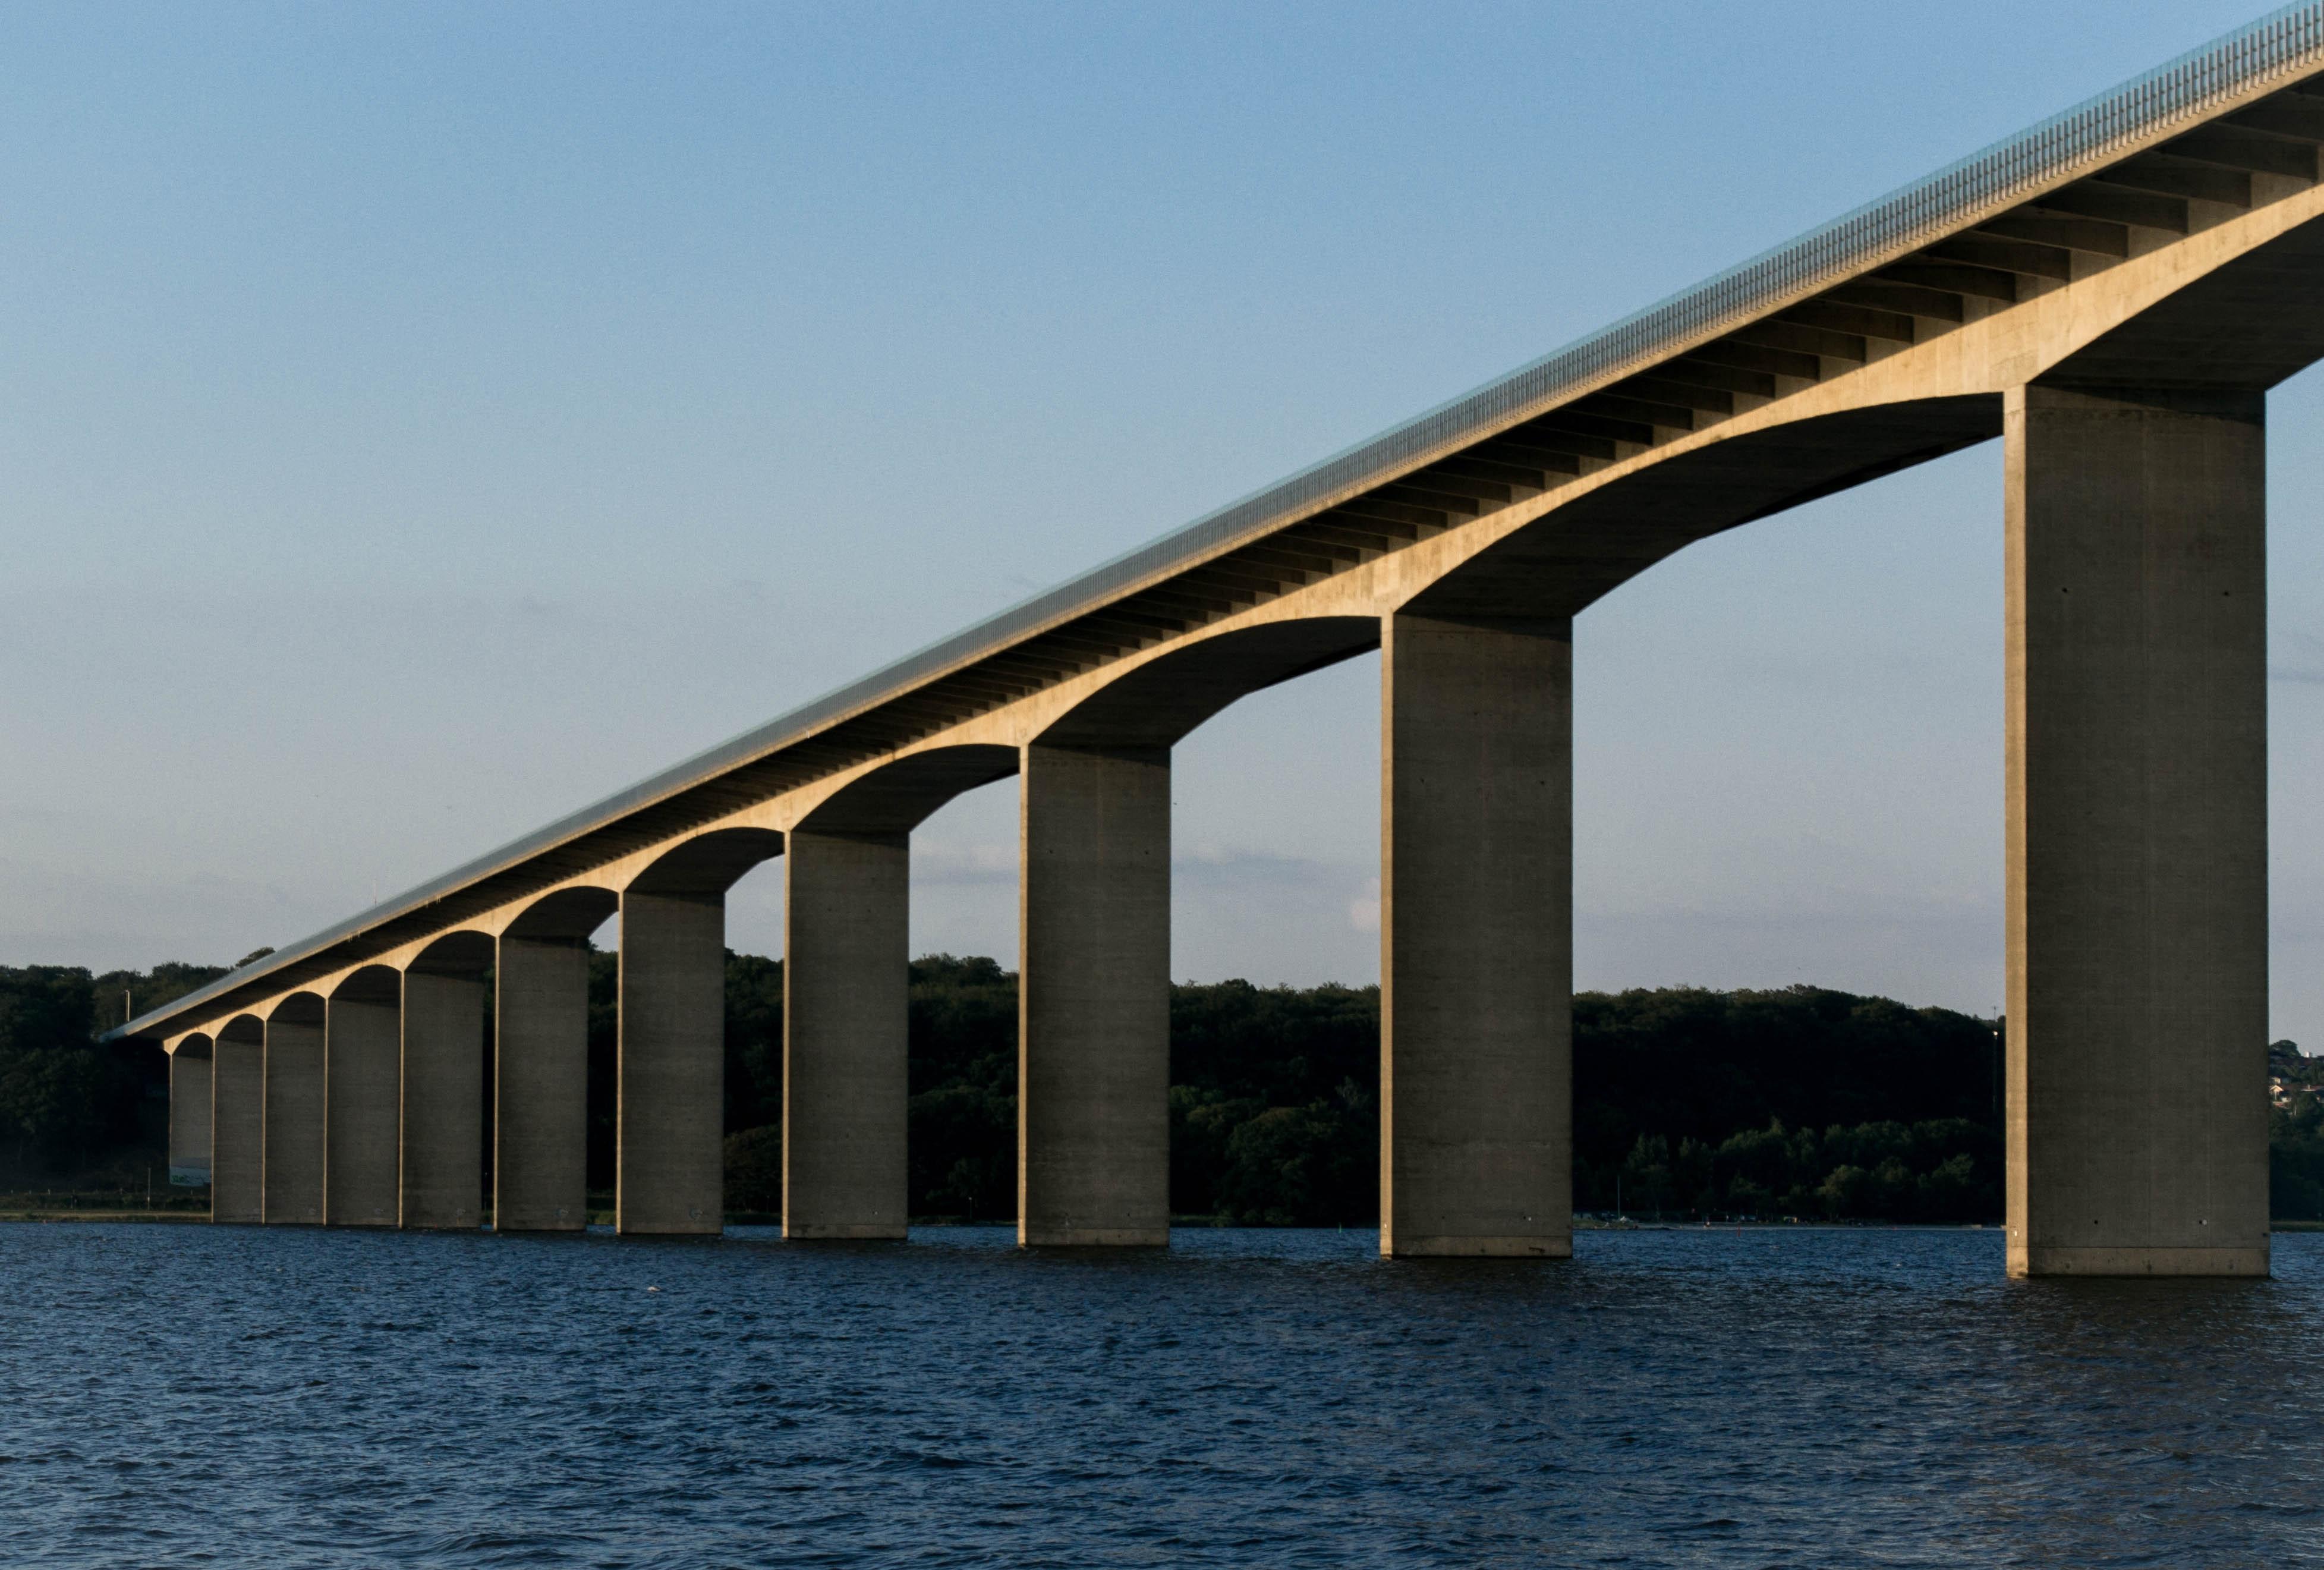 architecture-bridge-canada-53780